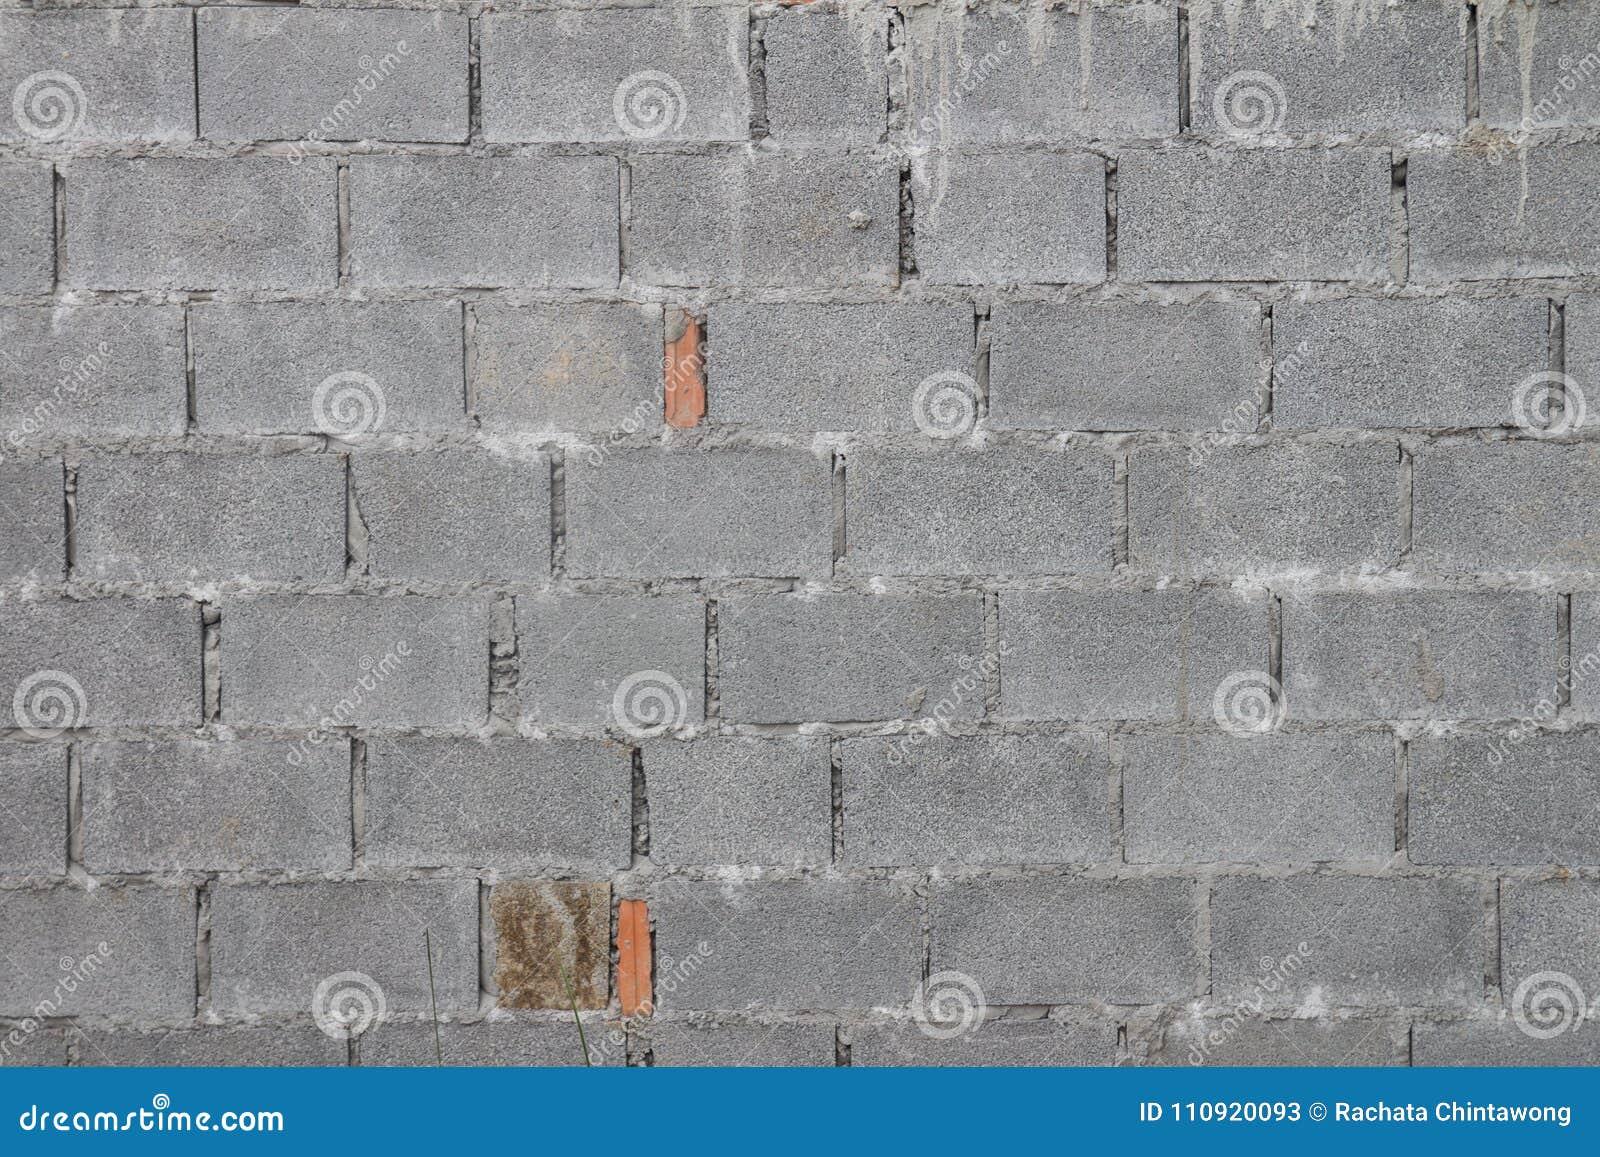 Masonry walls of aerated concrete 16